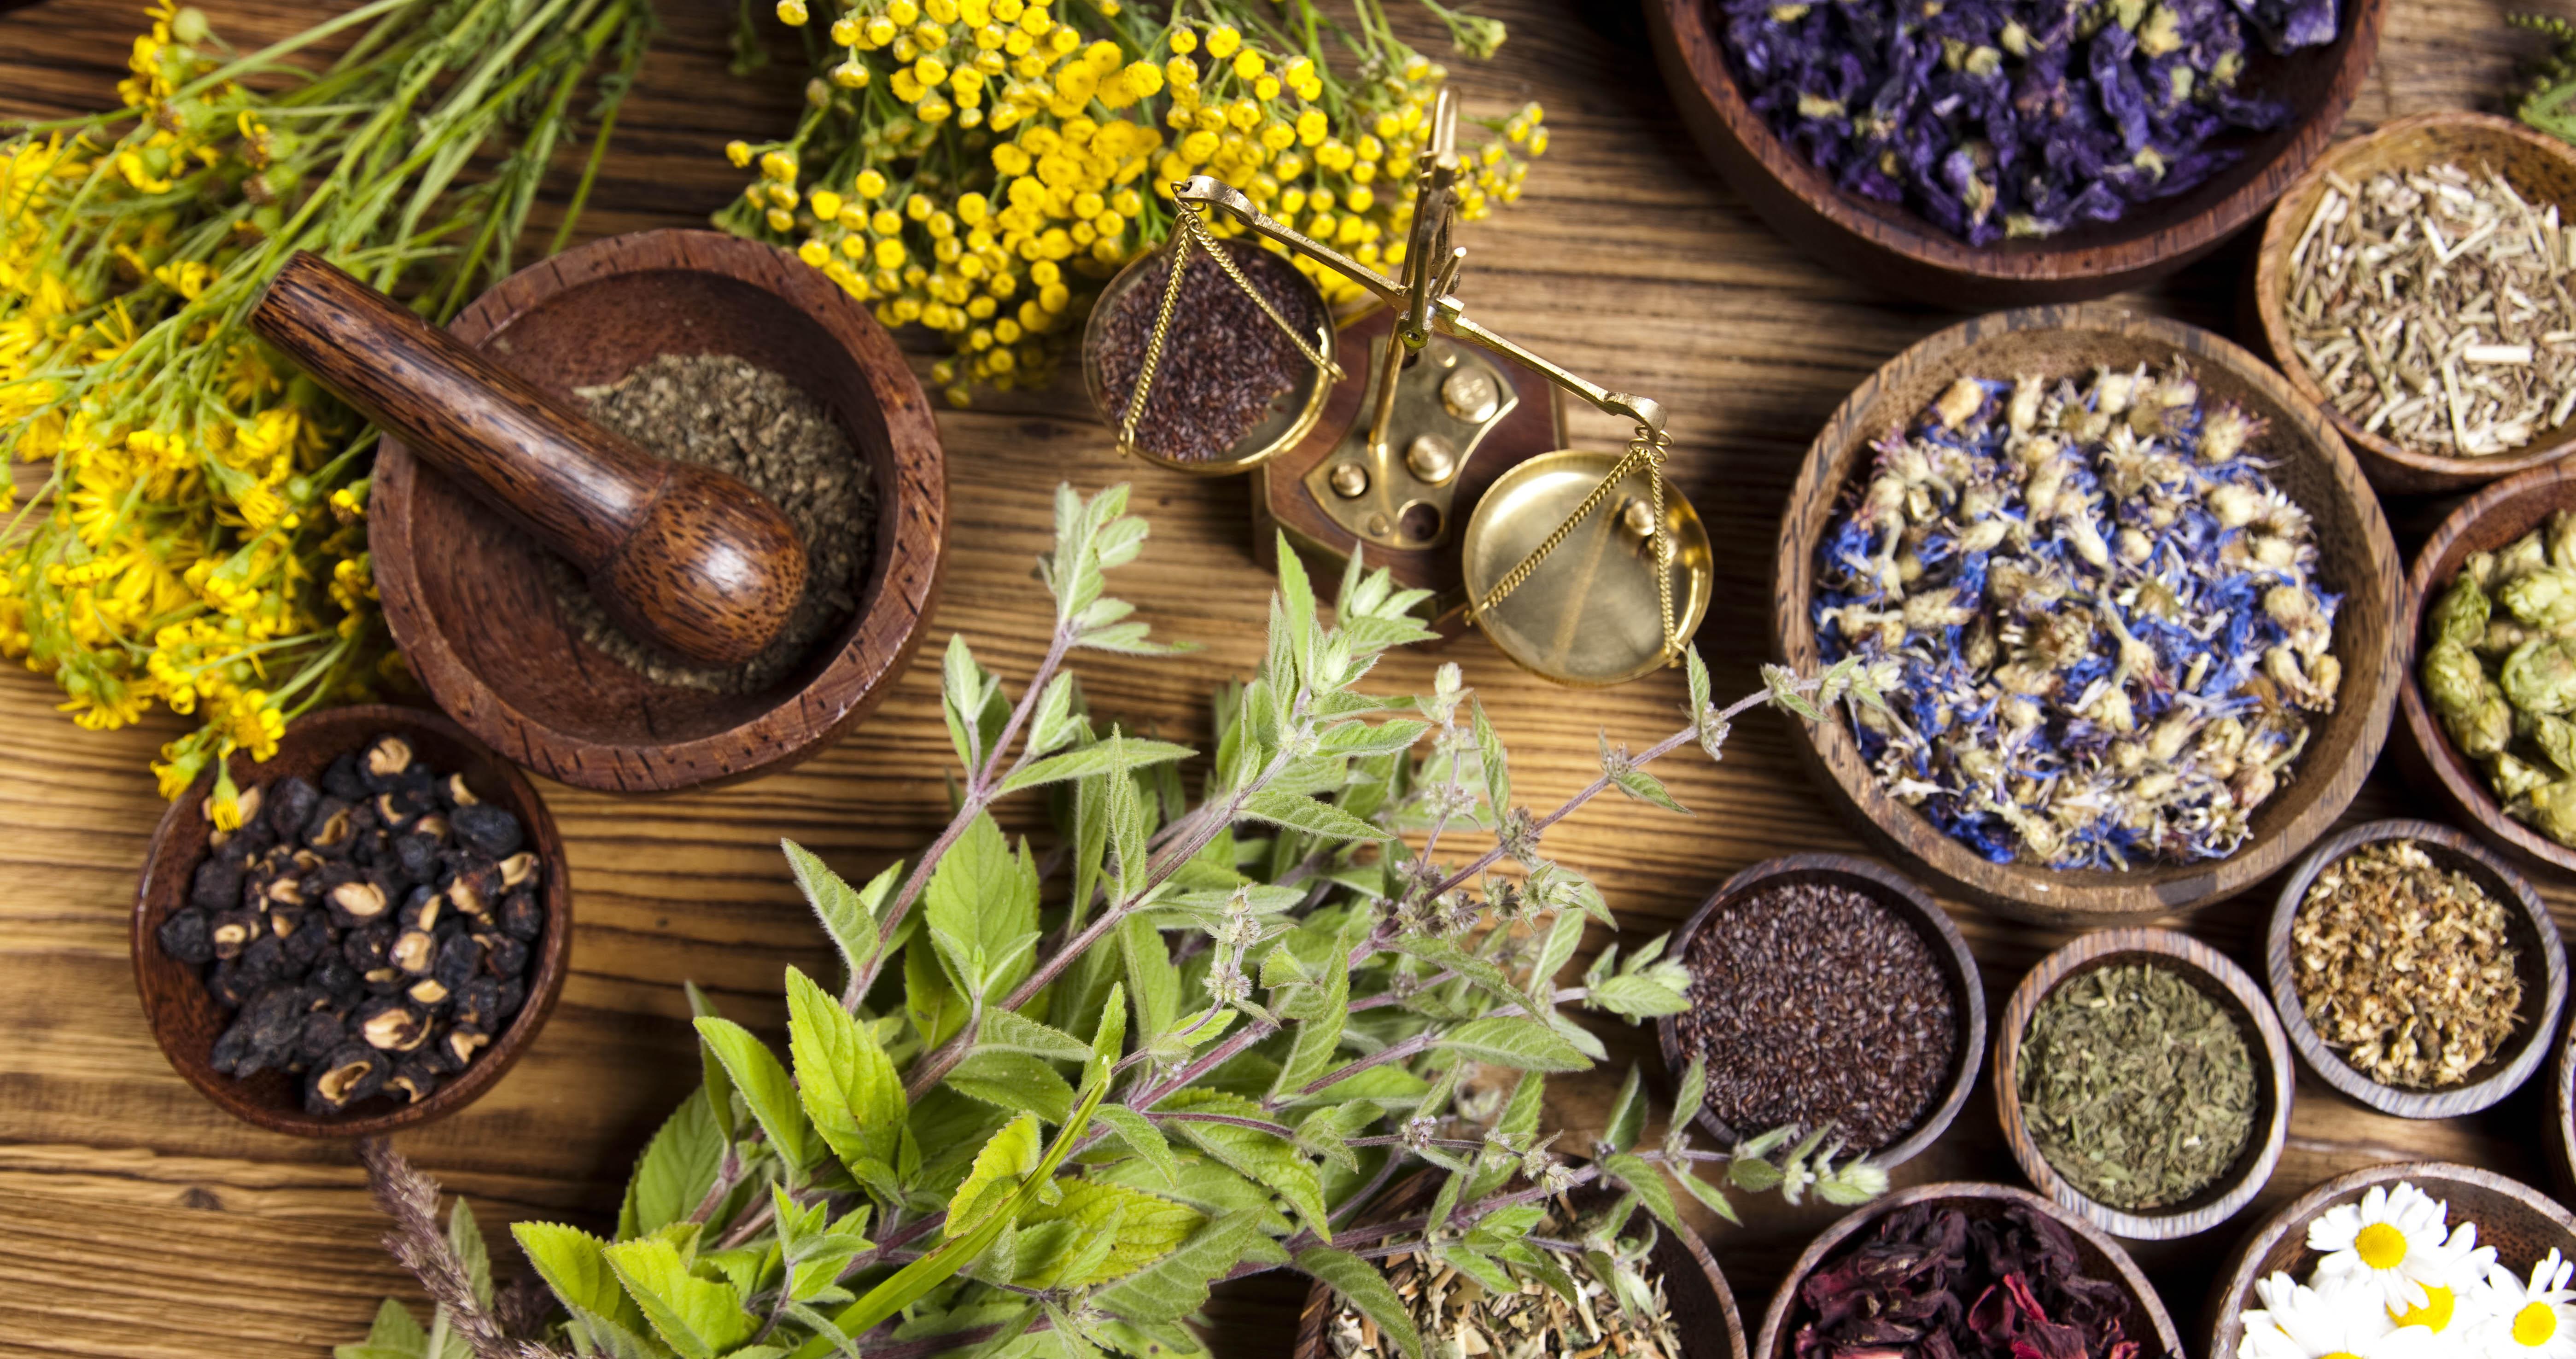 Buy herbs online -  Naturalhealthyherbs1 Natural Herbs For Diabetic Patients Buy Online By Naturalhealthyherbs1